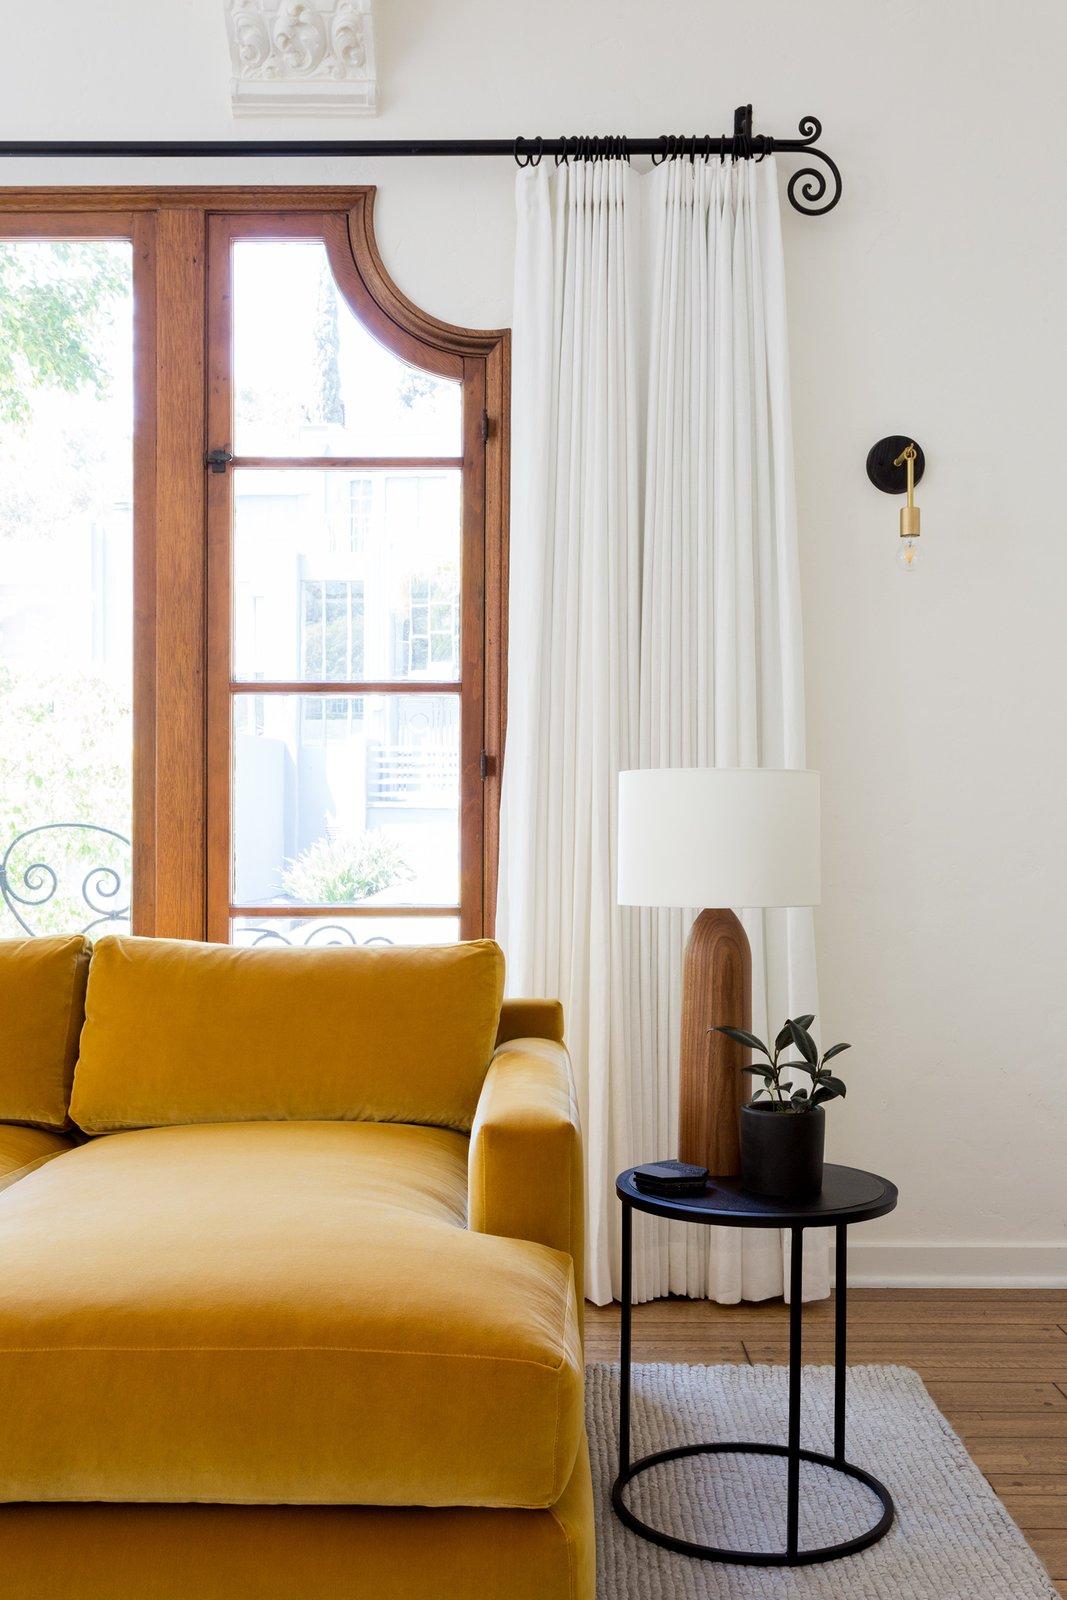 Living Room, Medium Hardwood Floor, Wall Lighting, Sofa, Table Lighting, and End Tables Living room  Dundee Residence by Jette Creative